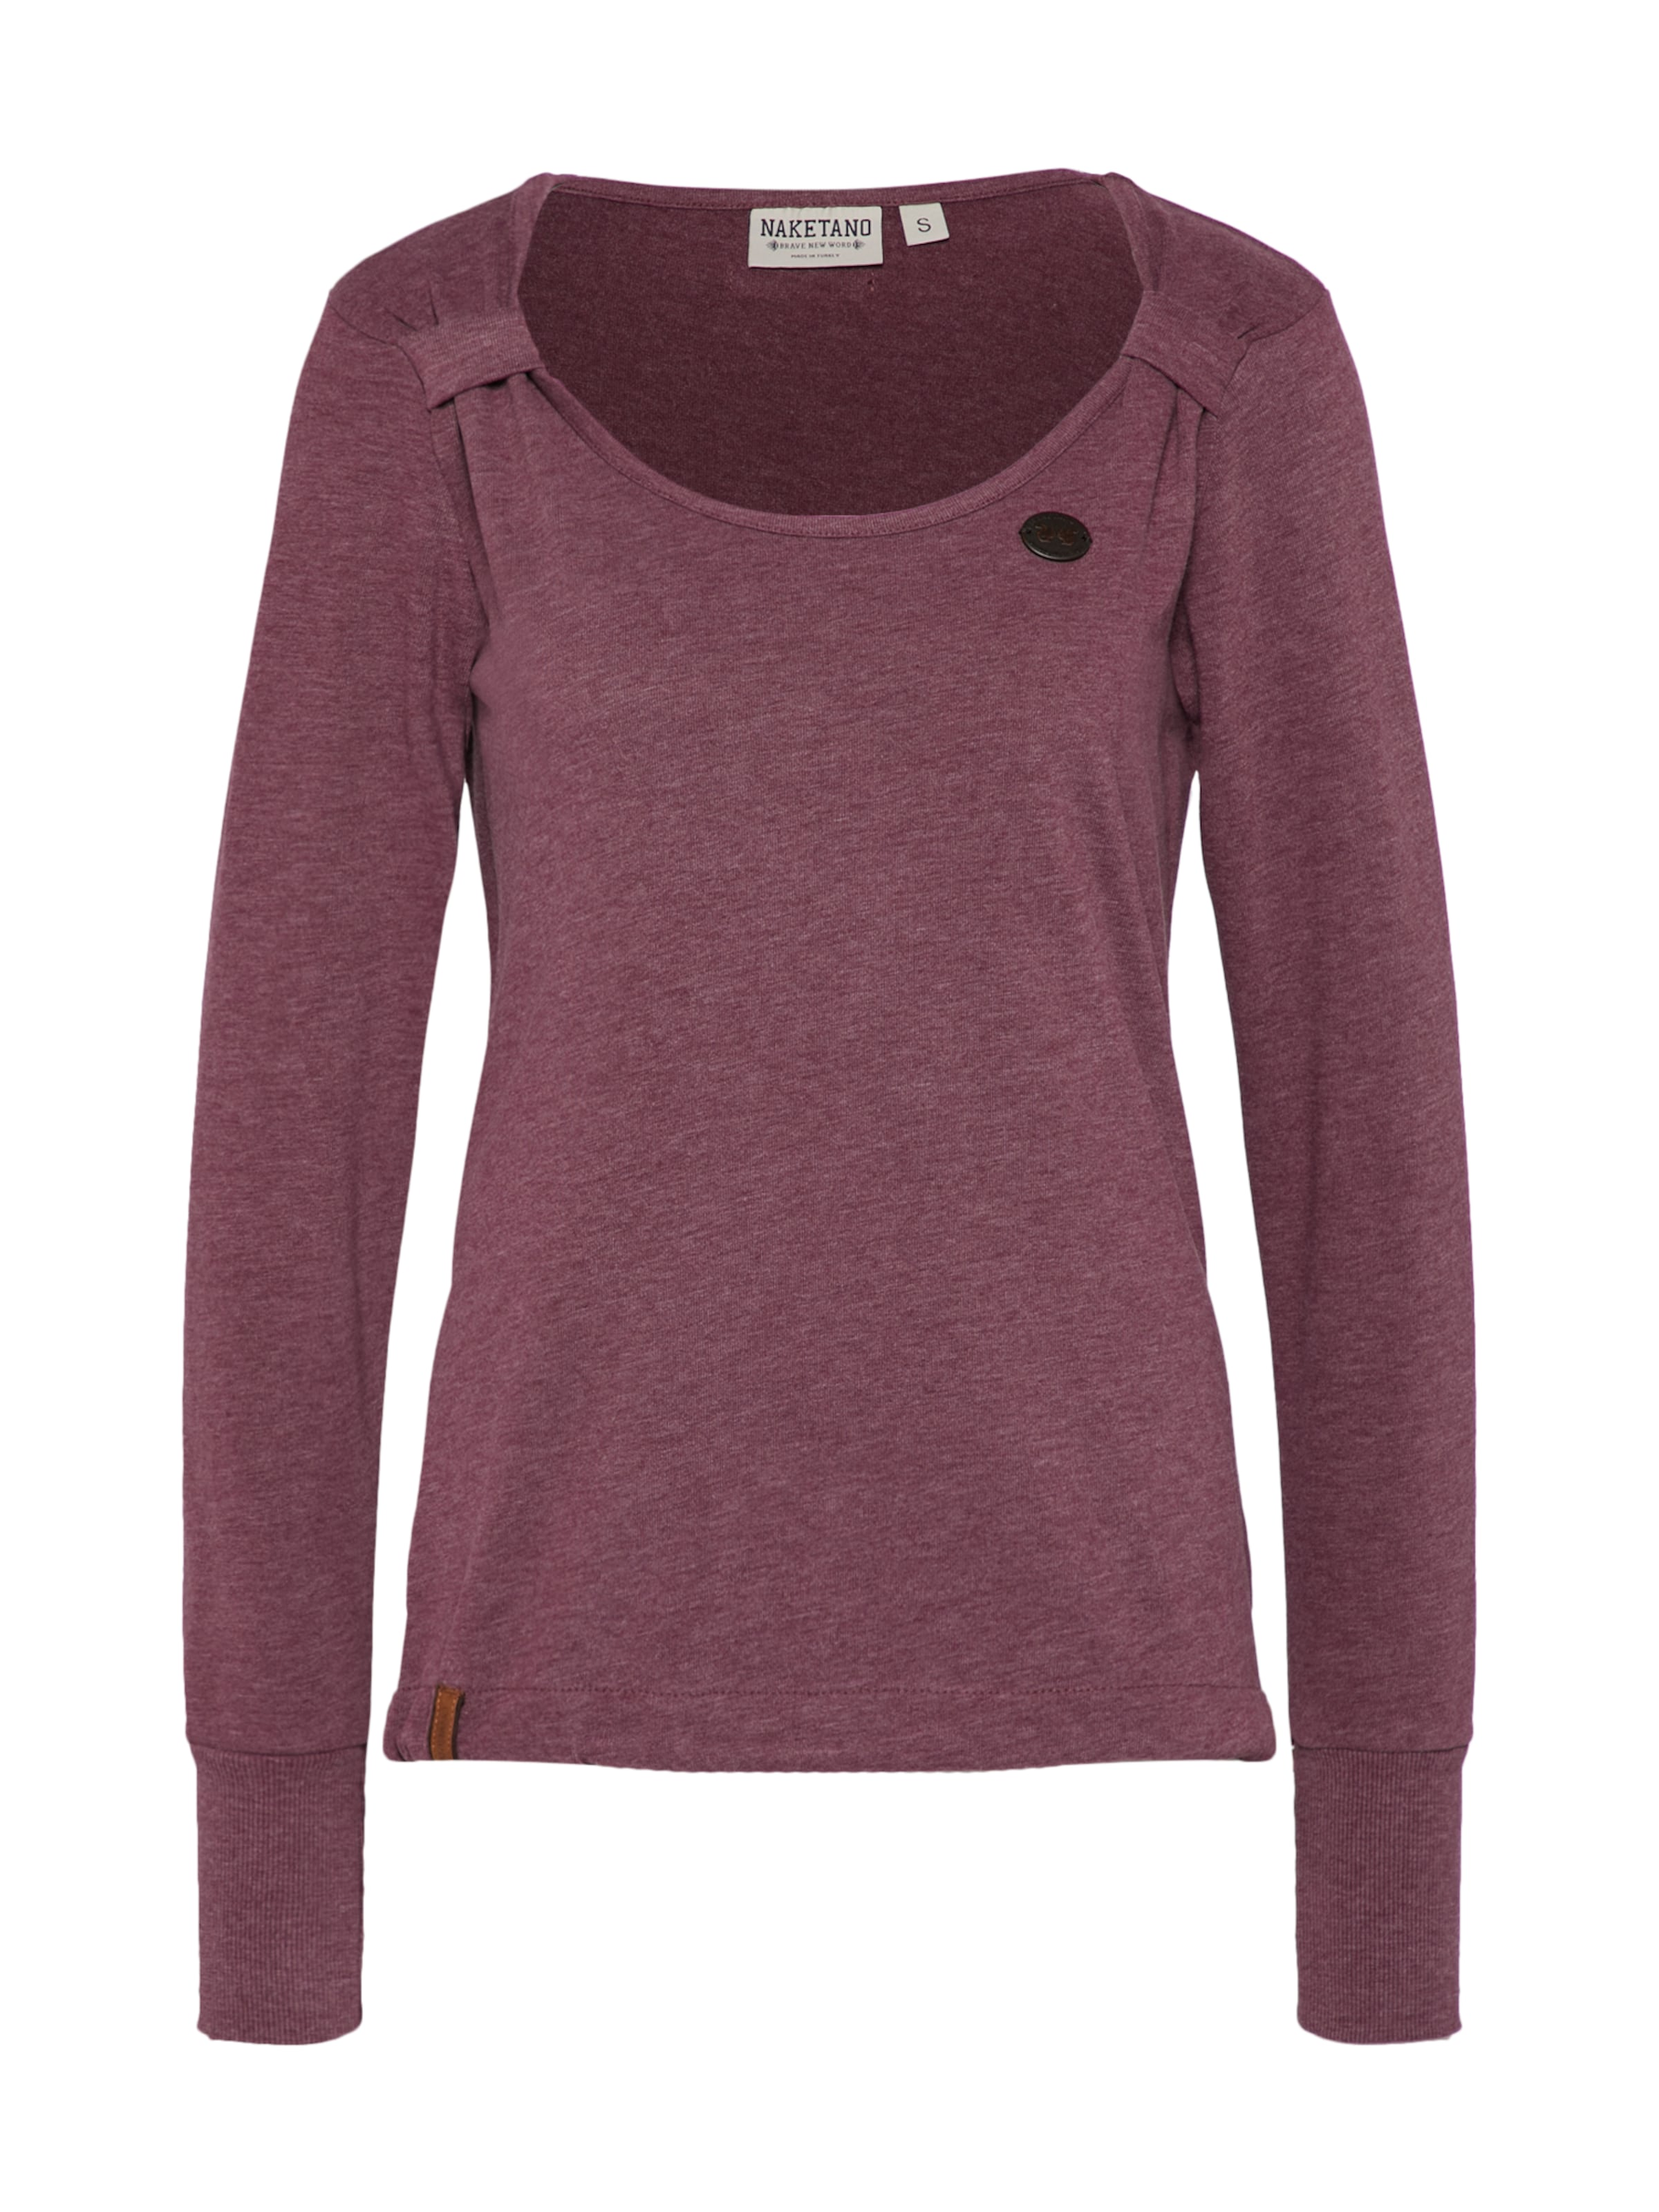 Dudelsack 'big Baie shirt Flavour' Naketano En Sweat wtxgEtqSU